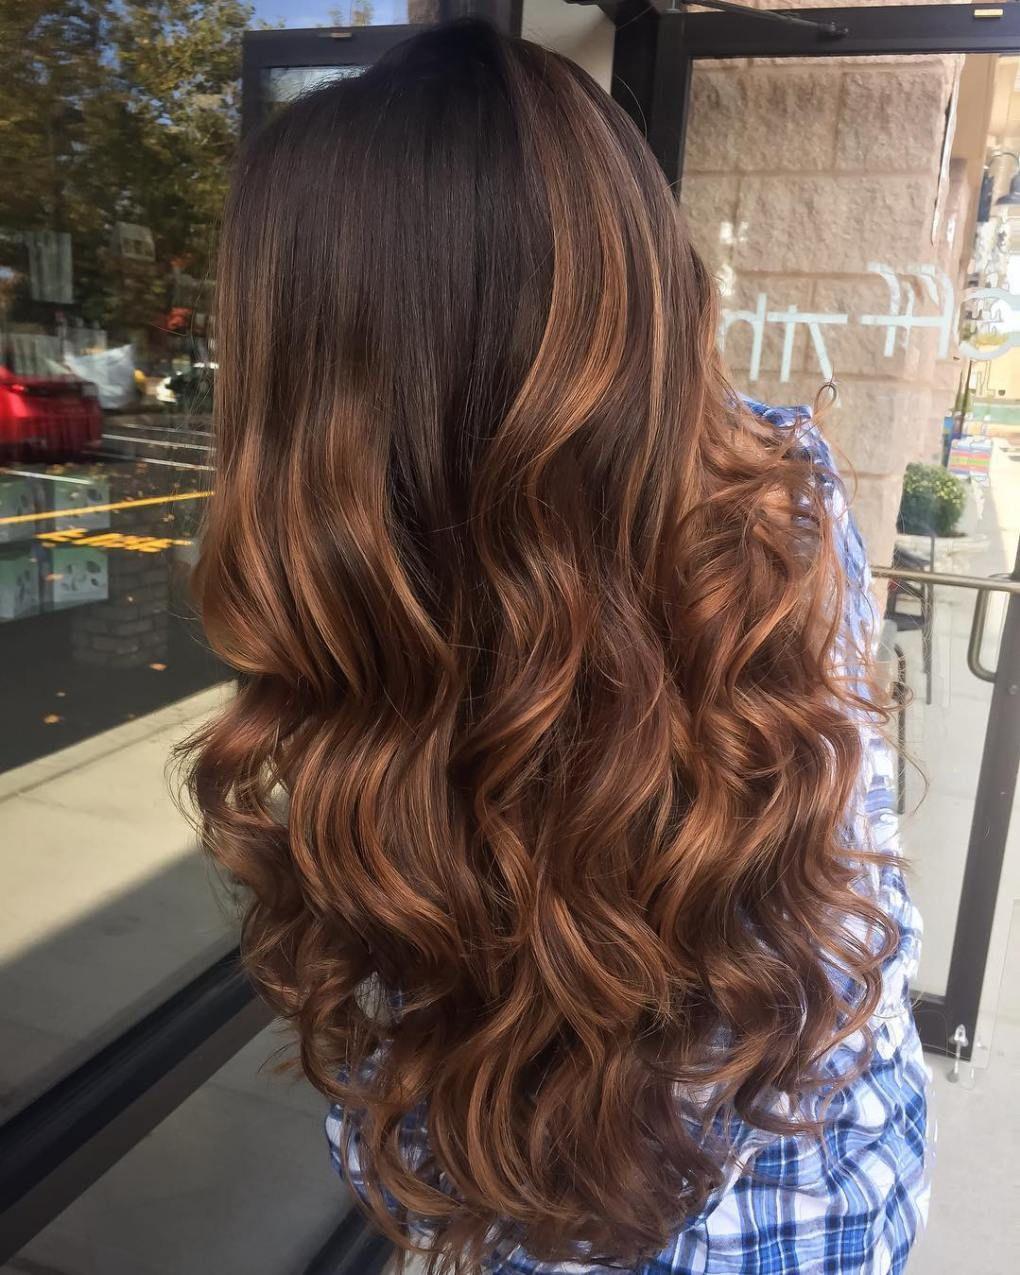 20 Tiger Eye Hair Ideas To Hold Onto Hair Colors Hair Balayage